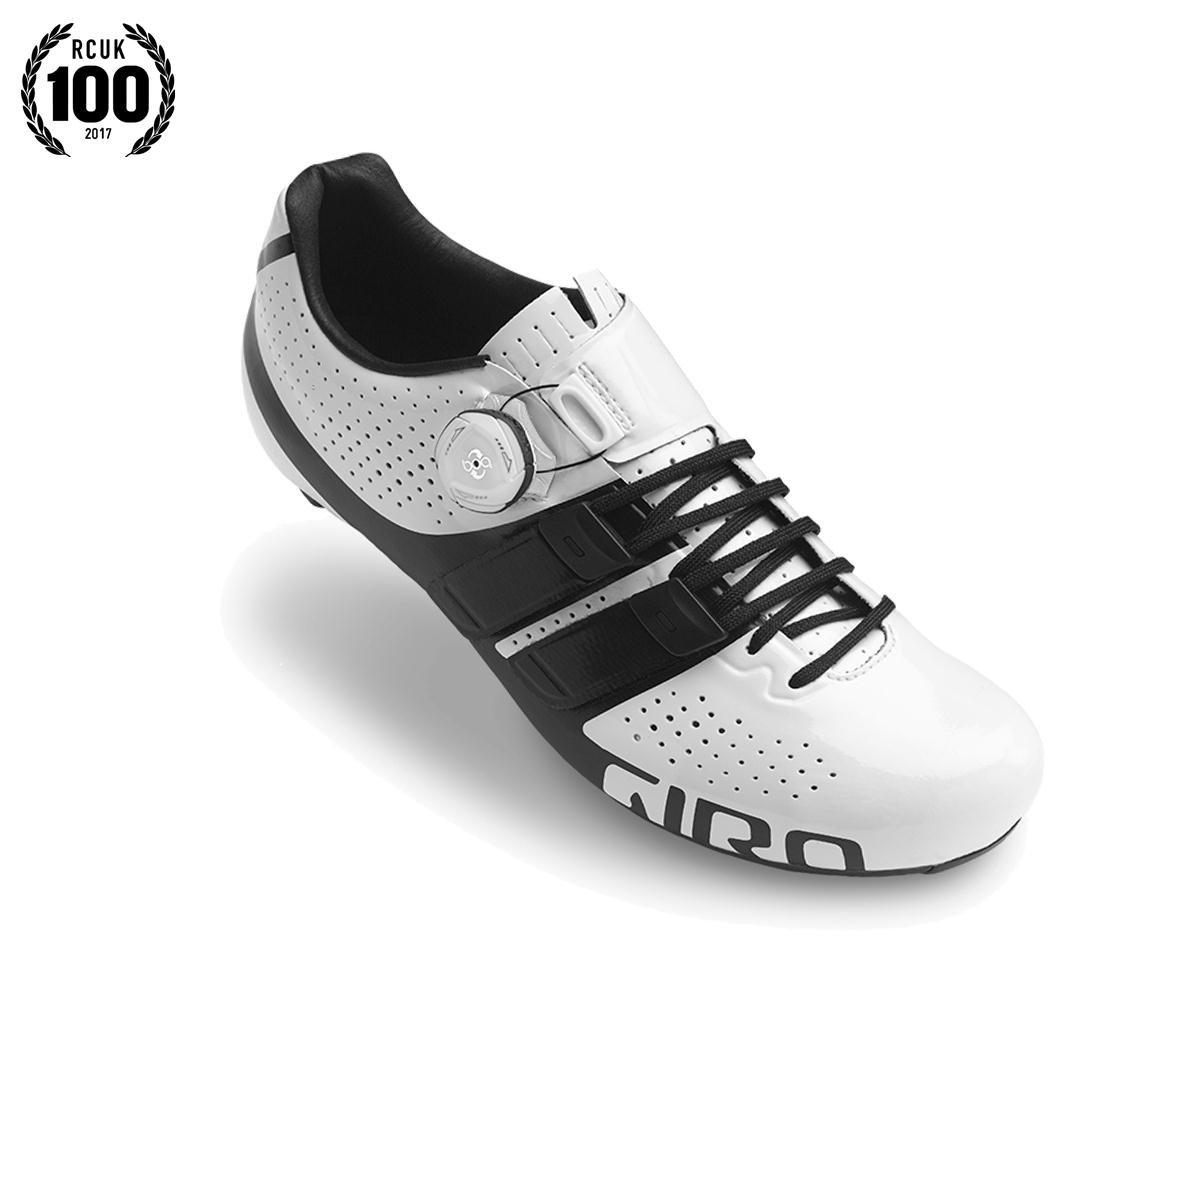 Giro Factor Techlace Road Cycling Shoes B01LZ43OB6 39.5 M EU|White/Black